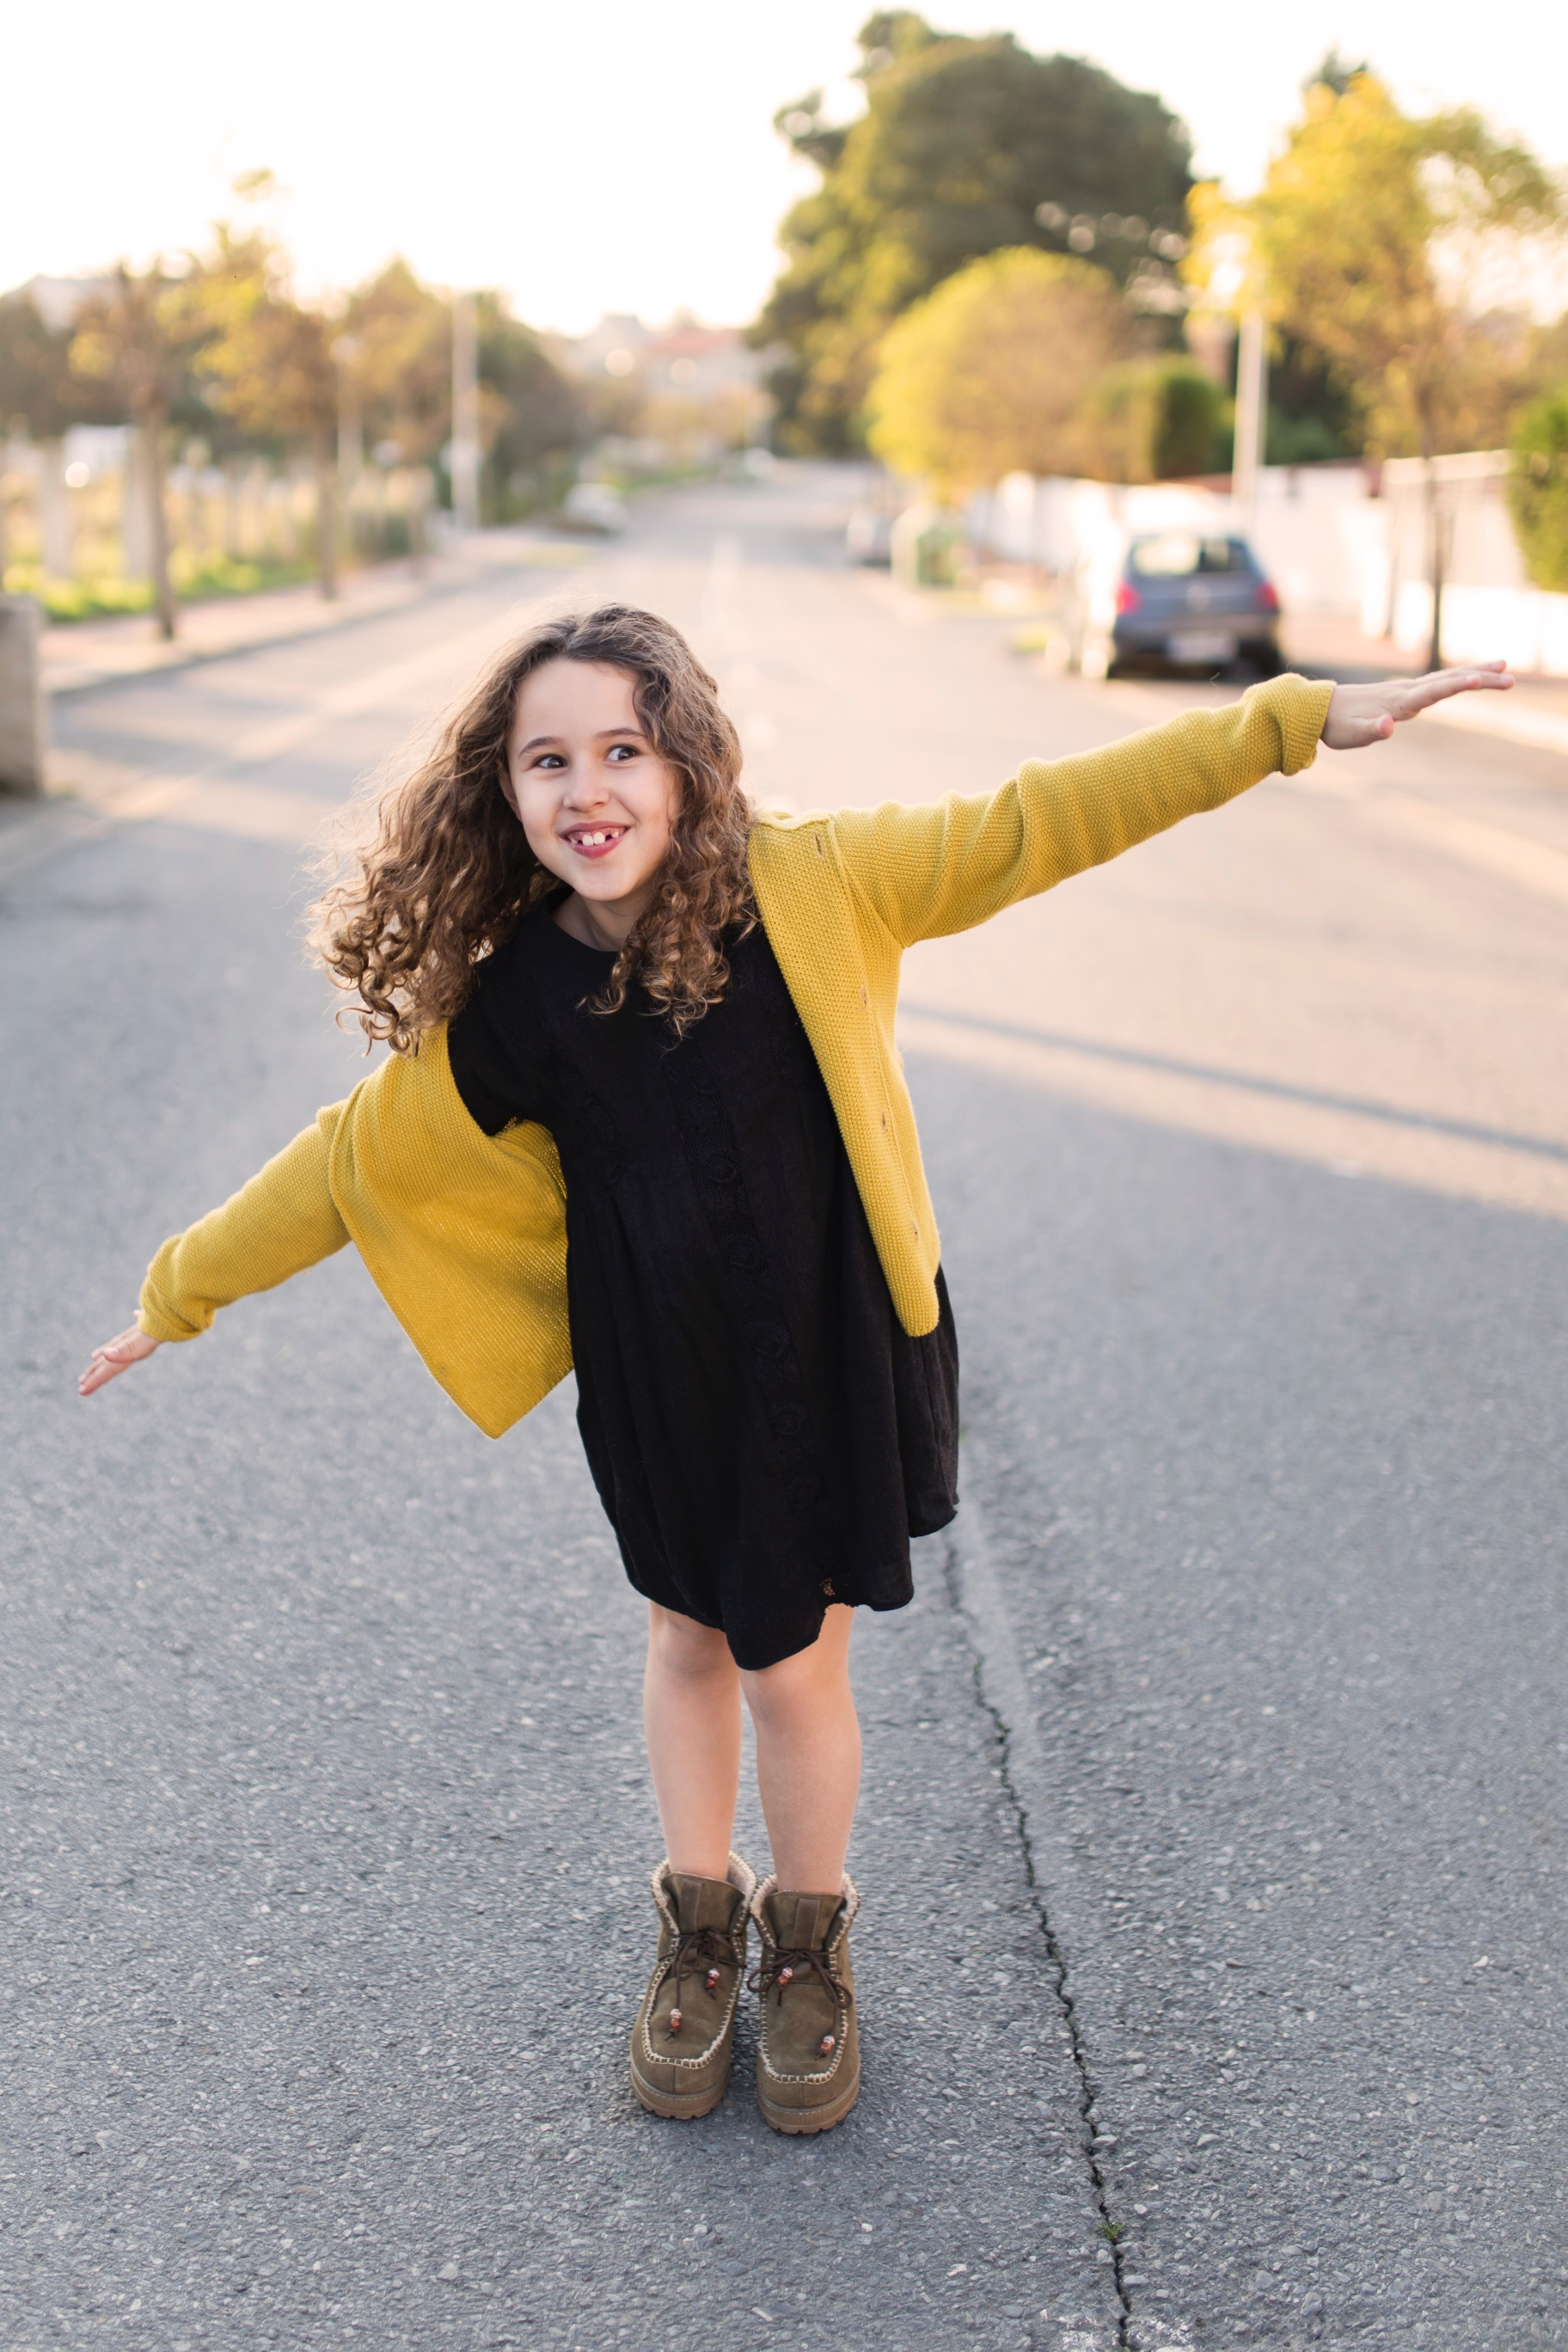 moda-infantil-descalzaporelparque-jimena-look-kids-omini-kids-ministyle-pisamonas-niños-zara-kids